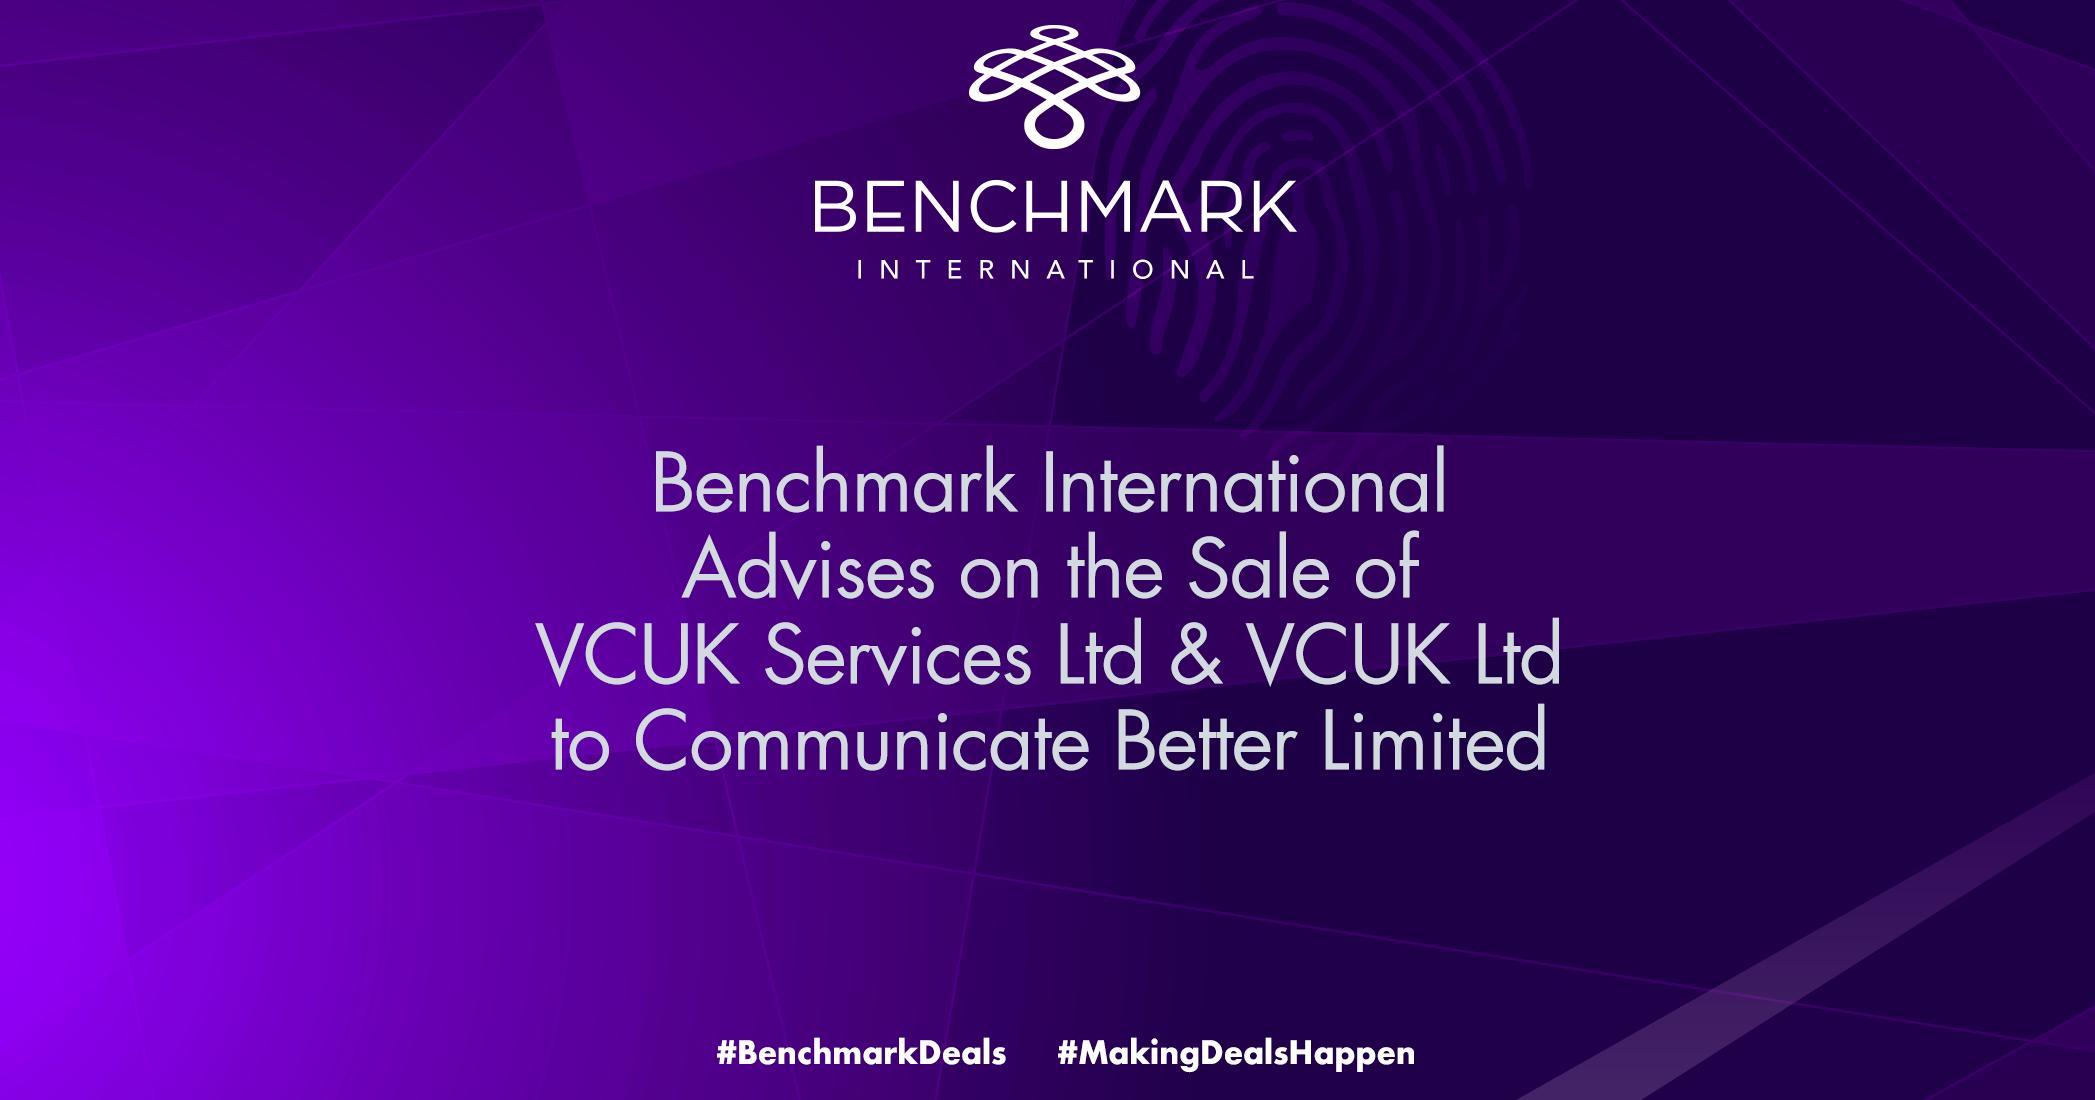 Benchmark International Advises on the Sale of VCUK Services Ltd & VCUK Ltd to Communicate Better Limited